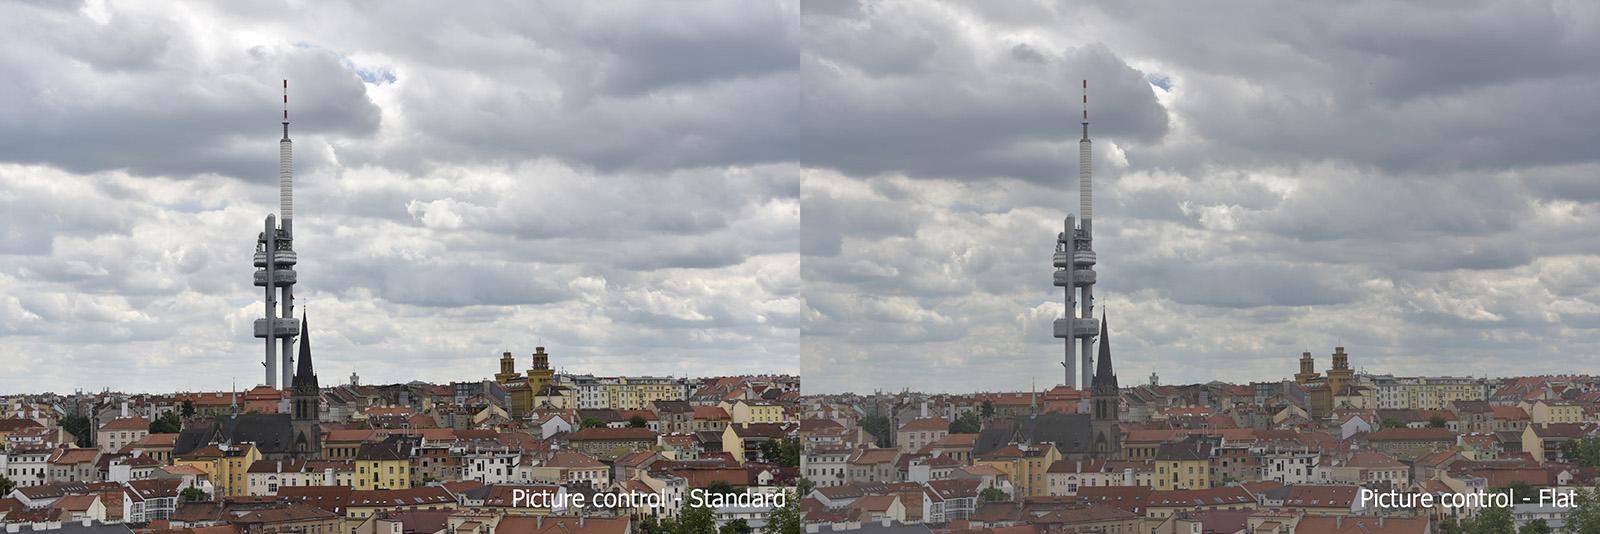 Nikon D810 Picture Control, Standard x Flat